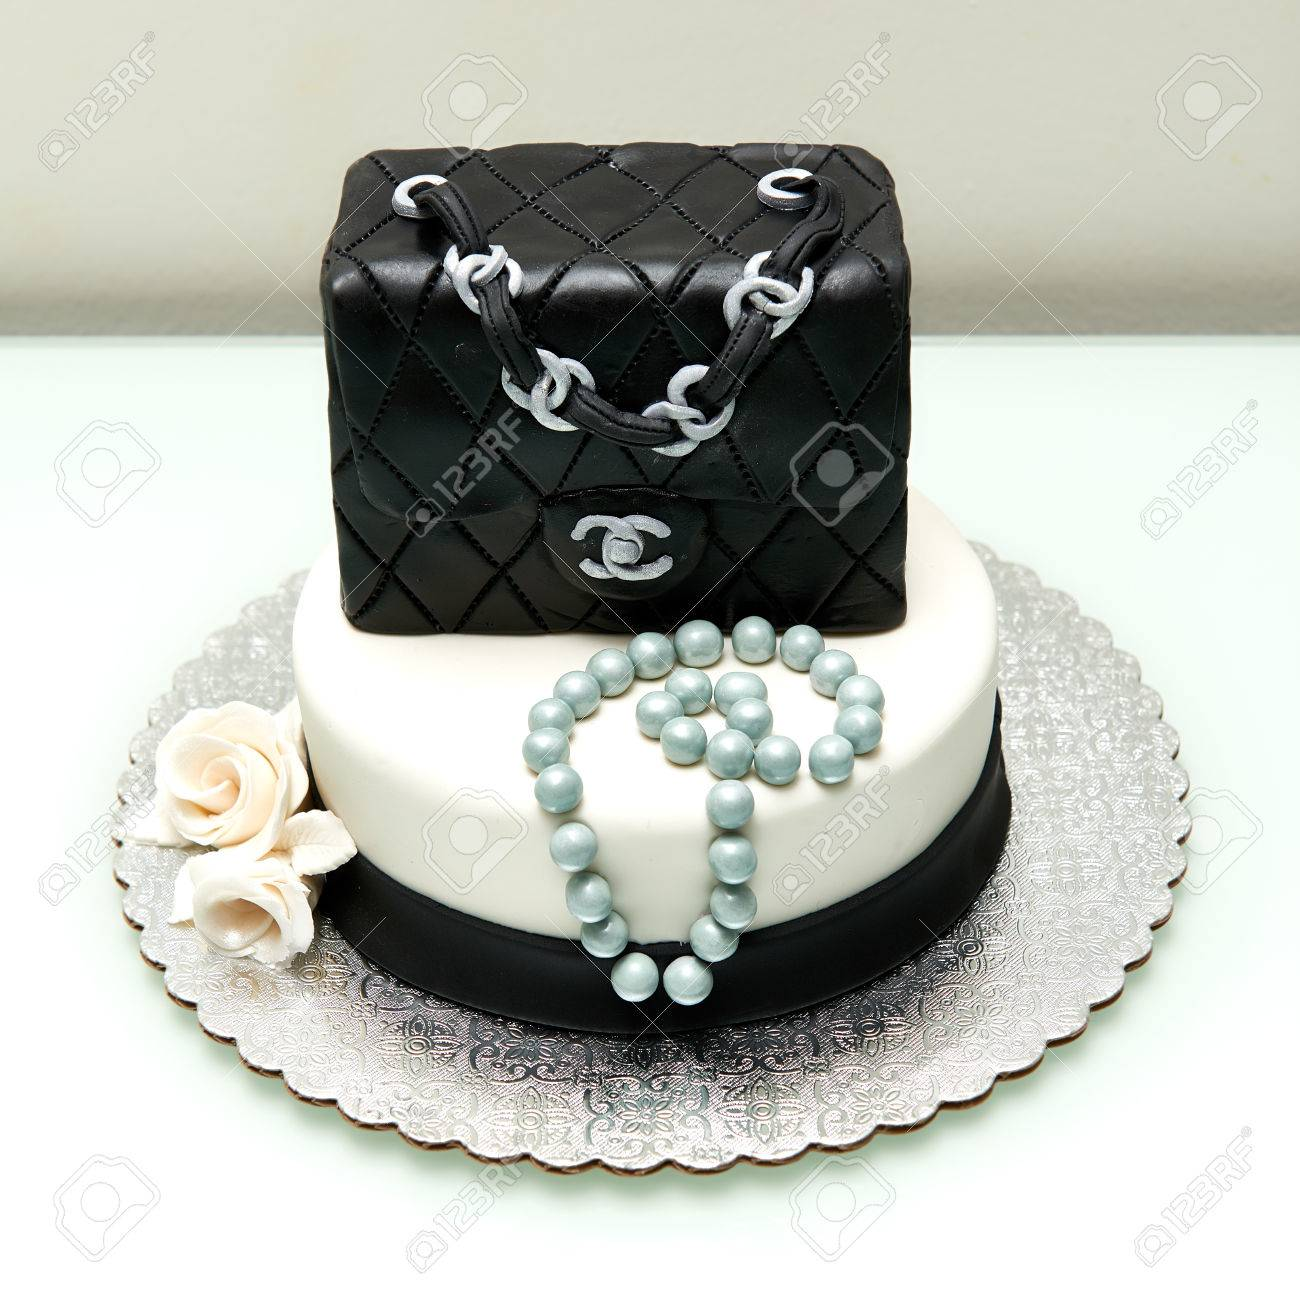 Homemade classic Chanel handbag in black fountain birthday cake. Stock  Photo - 72051262 15488f961d3cf